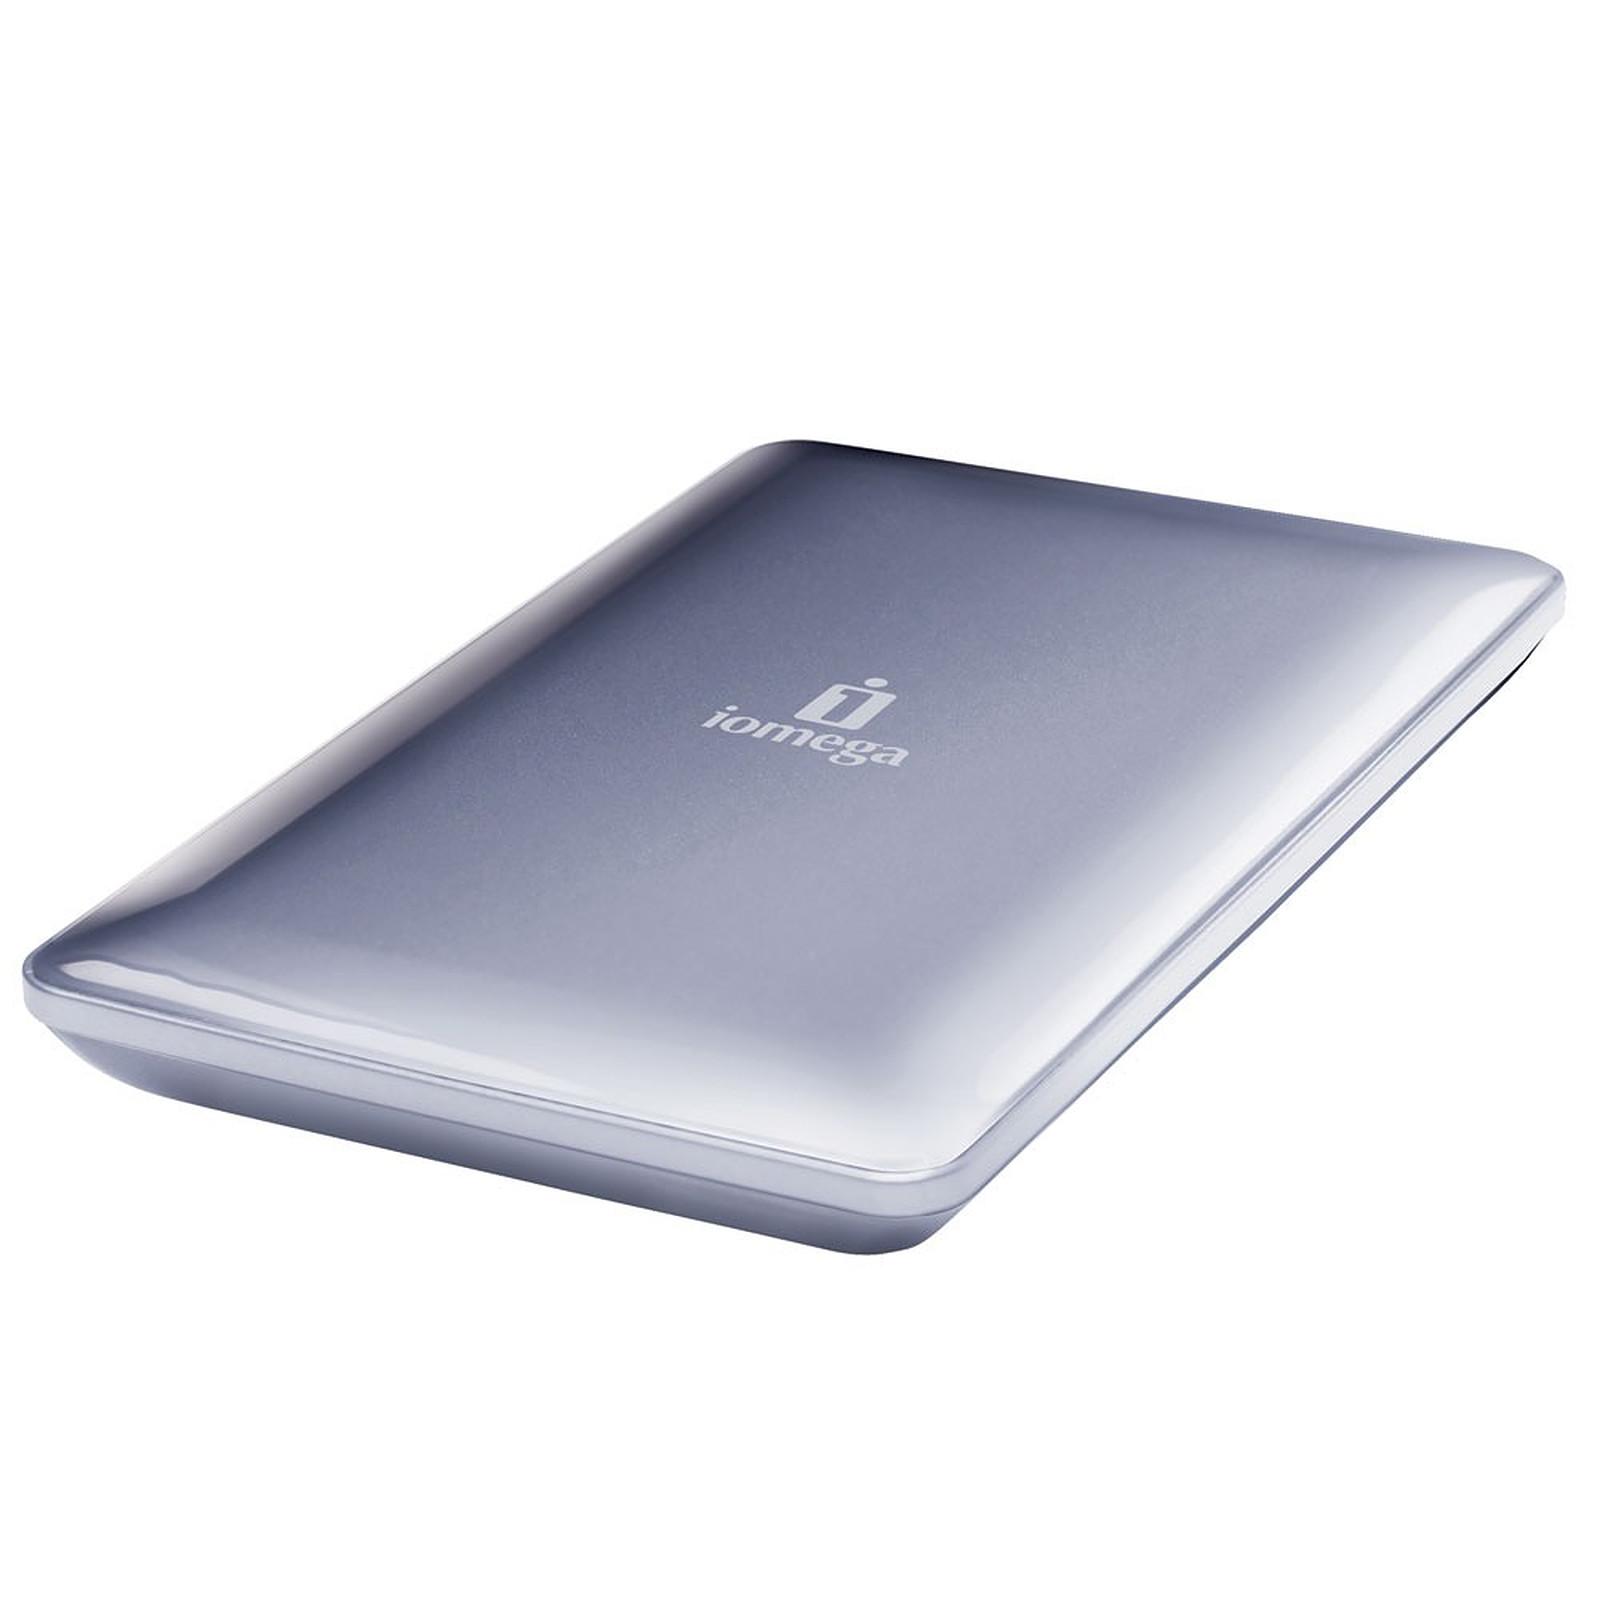 Iomega eGO Portable Hard Drive Mac Edition 500 Go Argent (USB 2.0/FireWire400/800)